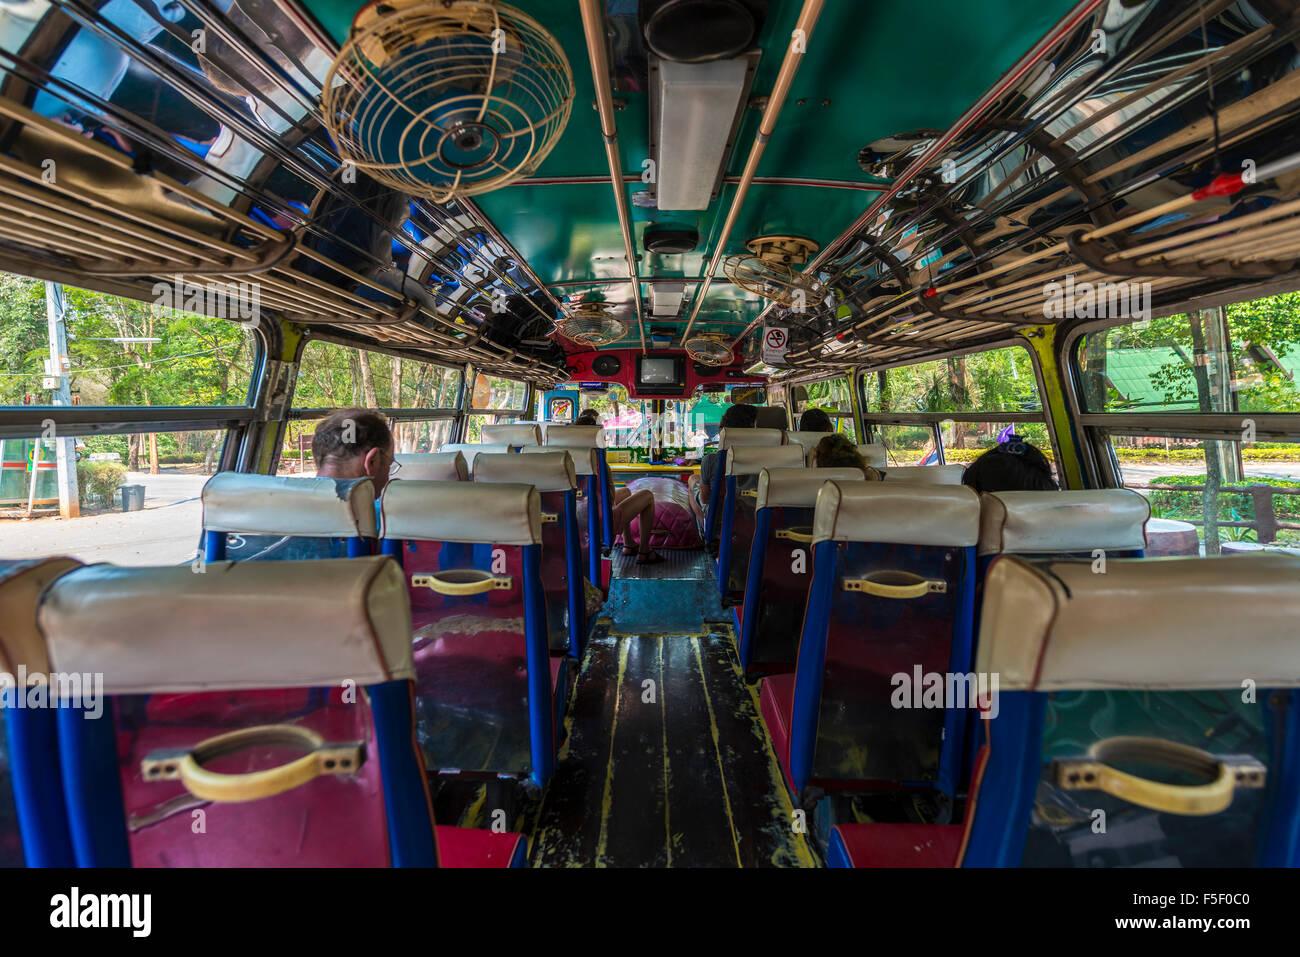 Thai bus interior, Kanchanaburi Province, Central Thailand, Thailand - Stock Image